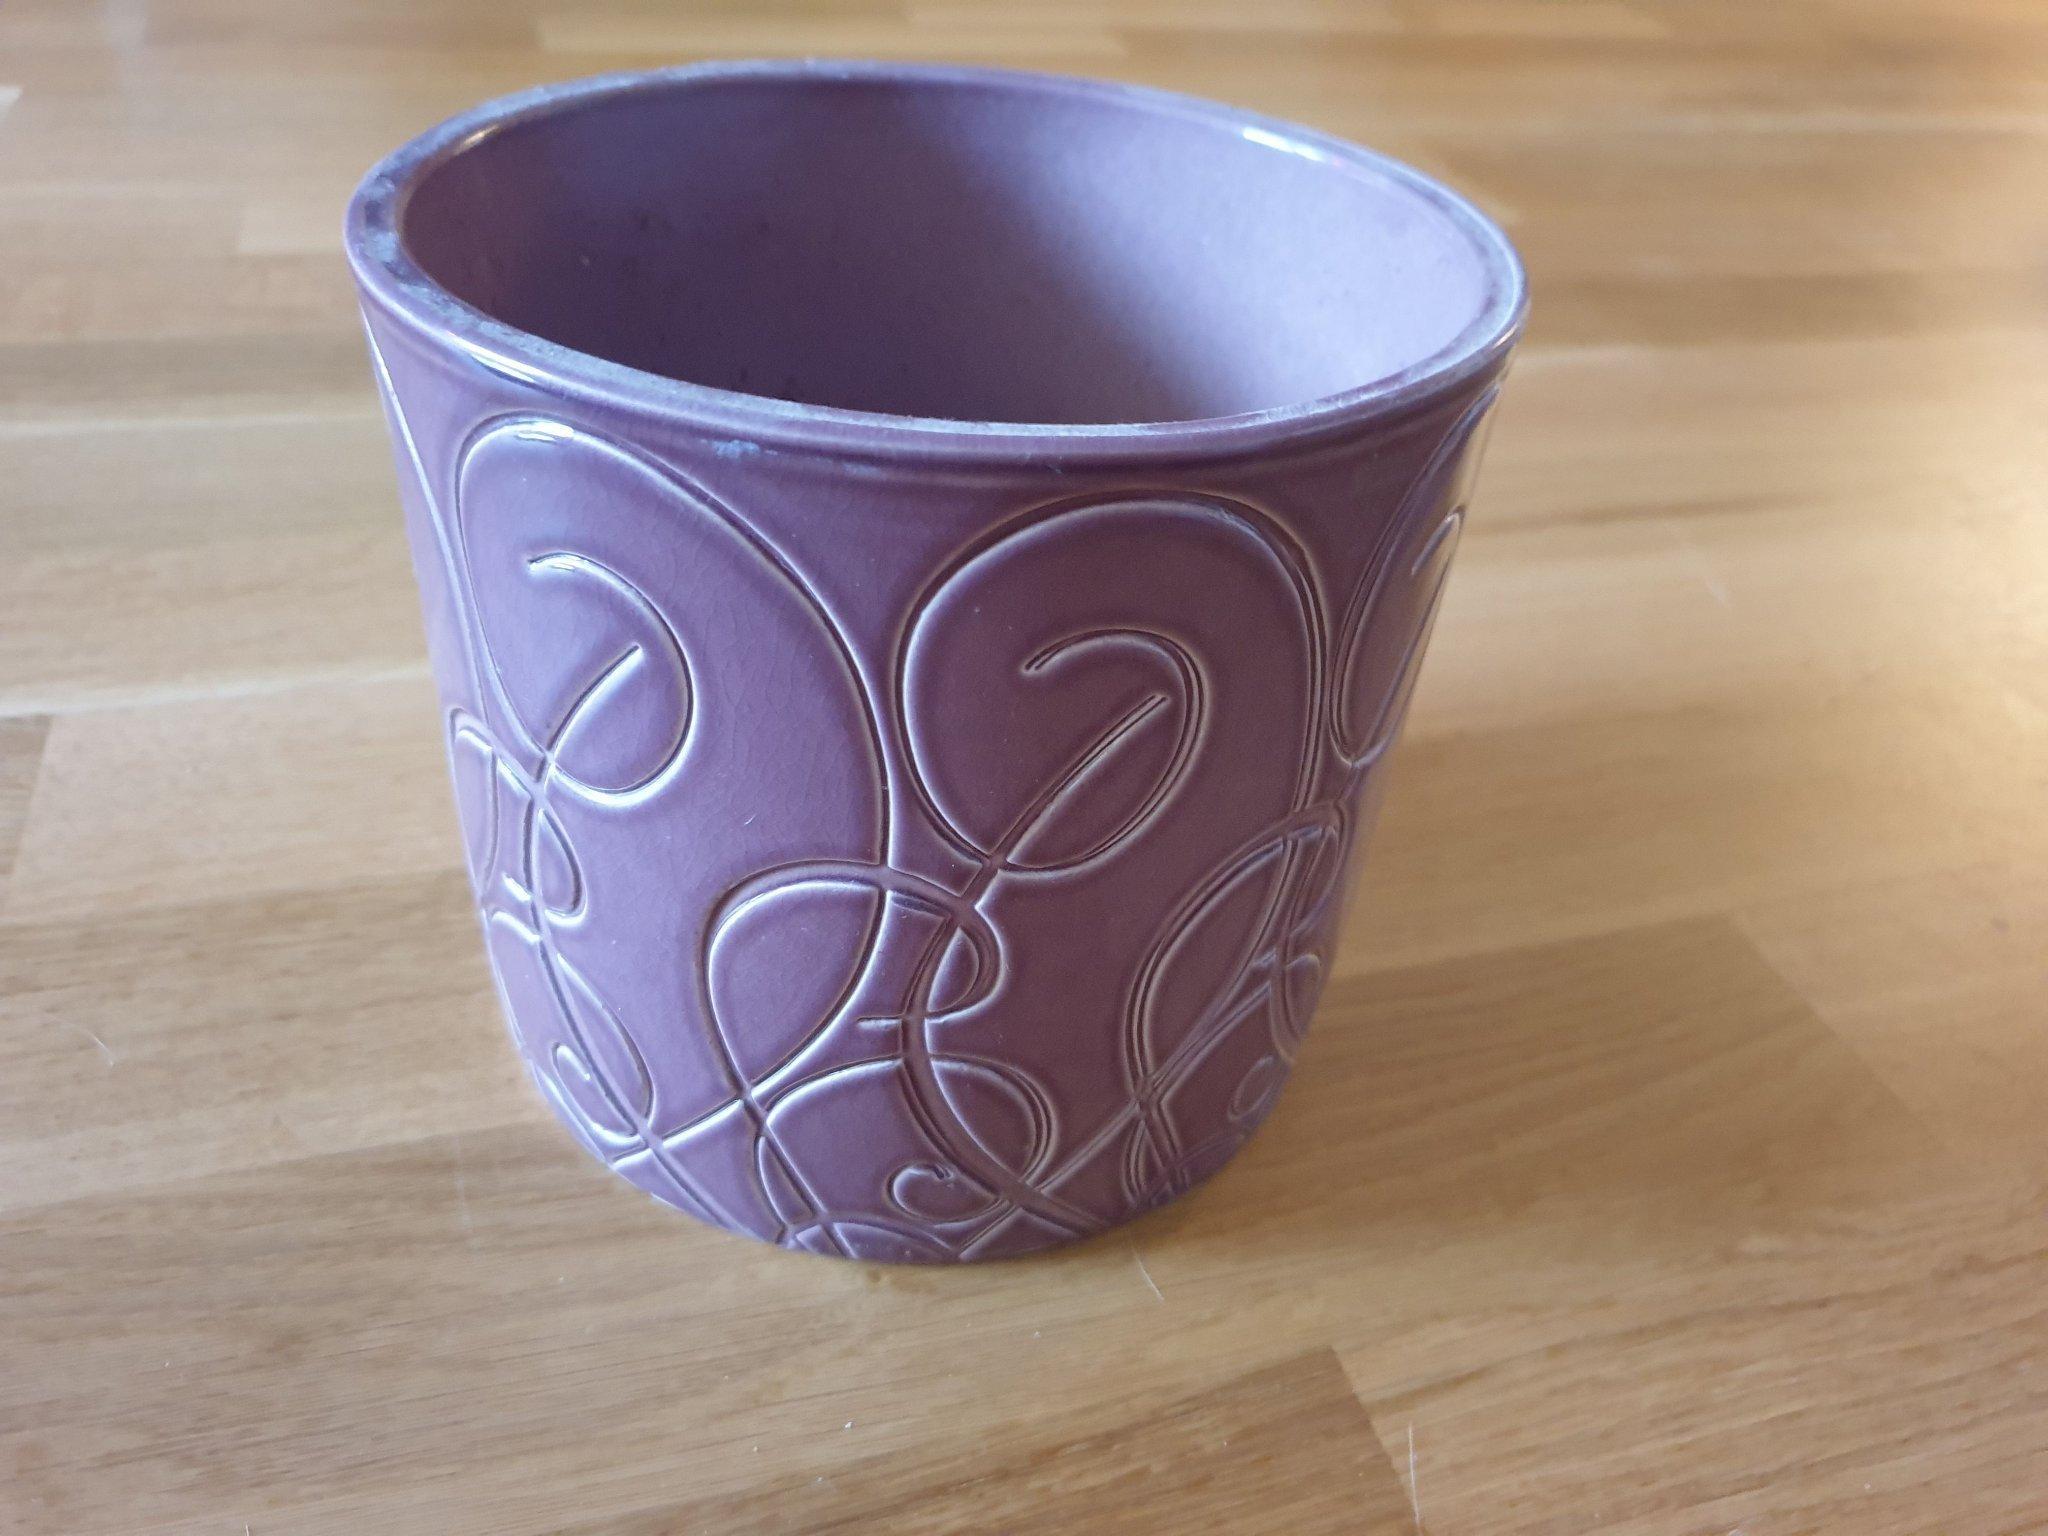 Stor Lila Kruka Ytterkruka I Keramik 421704374 ᐈ Kop Pa Tradera